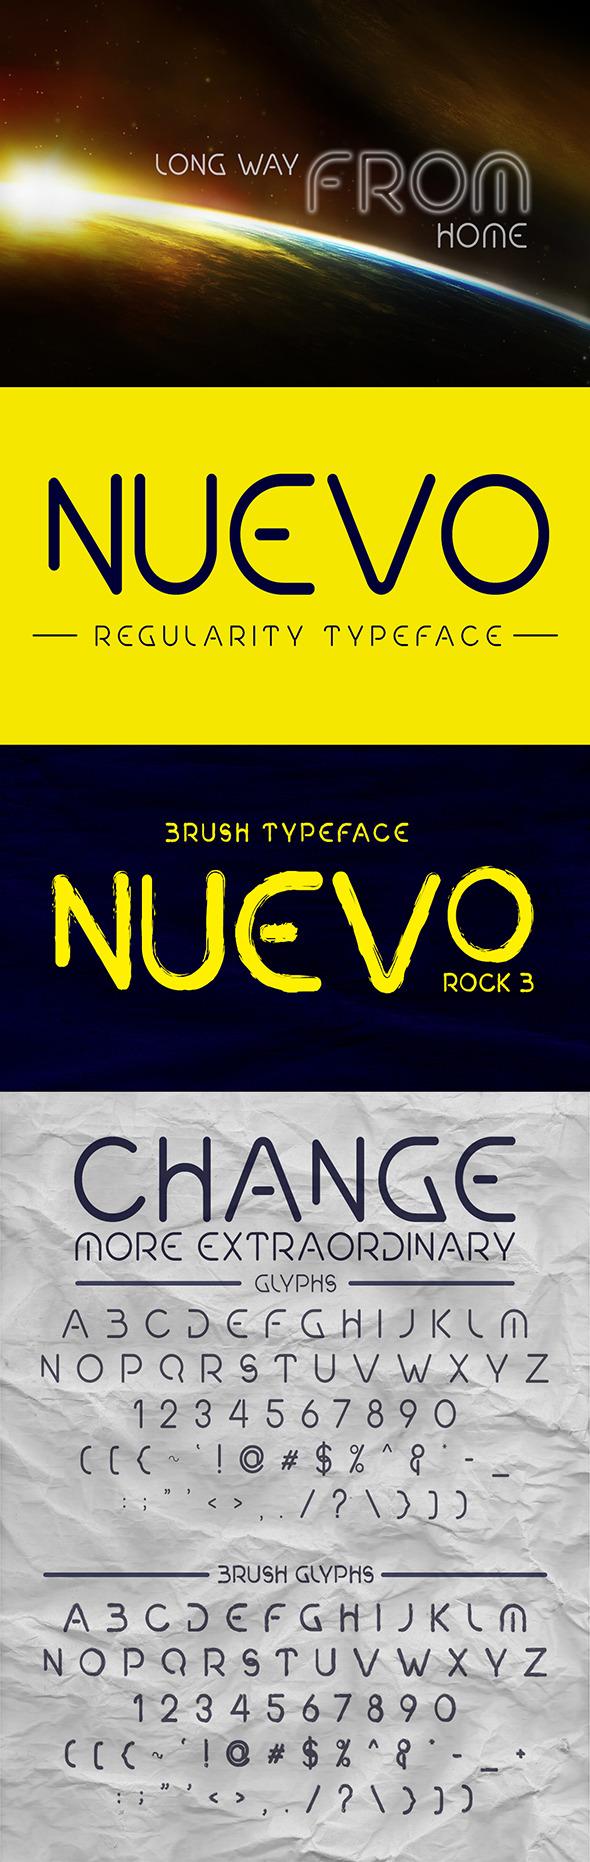 NUEVO REGULARITY FONT - Sans-Serif Fonts